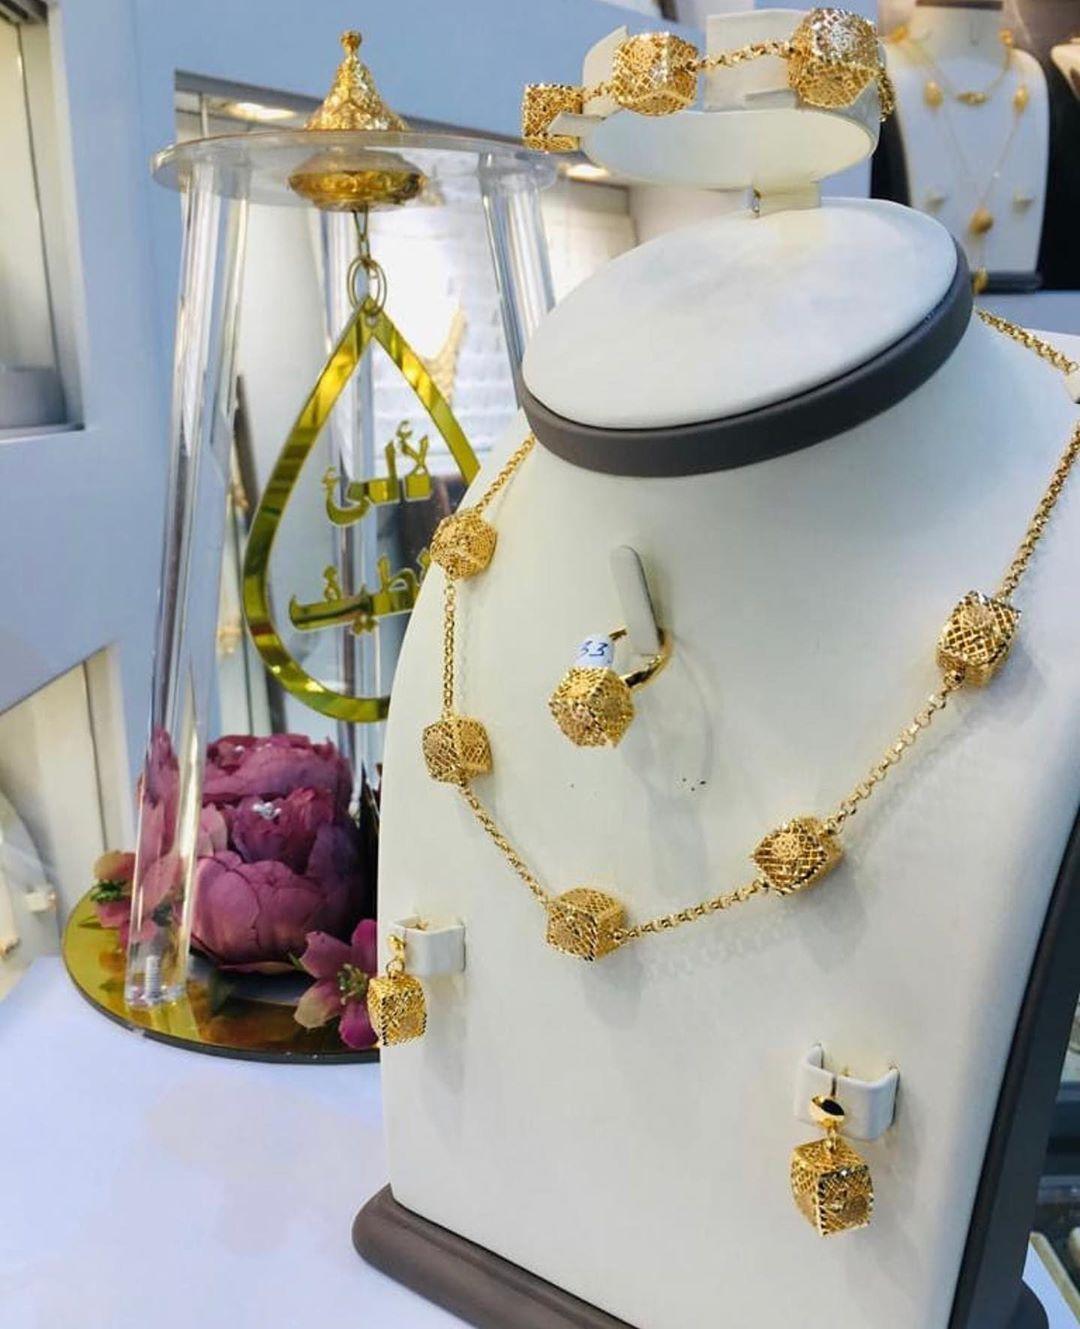 Lalae Alqatif Jewellery طقم تركي ذهب عيار ٢١ من مجوهرات لآلئ القطيف للطلب والاستفسار عن الاسعار التواصل مع المحل Jewellry